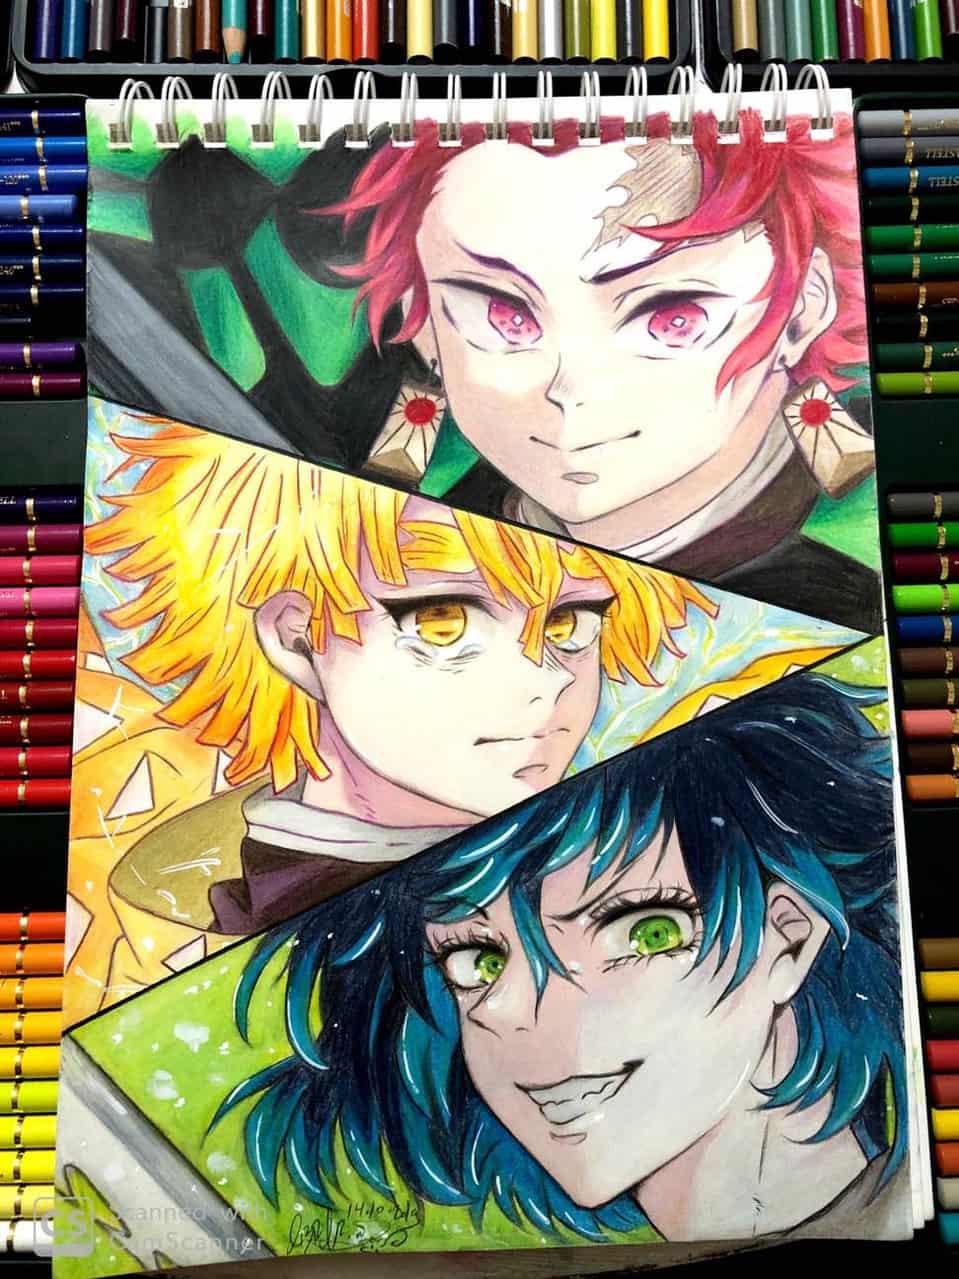 Tanjirou - Zenitsu - Inosuke || Kimetsu no Yaiba  Illust of Abrar Chan DemonSlayerFanartContest art KamadoTanjirou fanart Fanarts fan anime drawing KimetsunoYaiba Animedraw Drawings